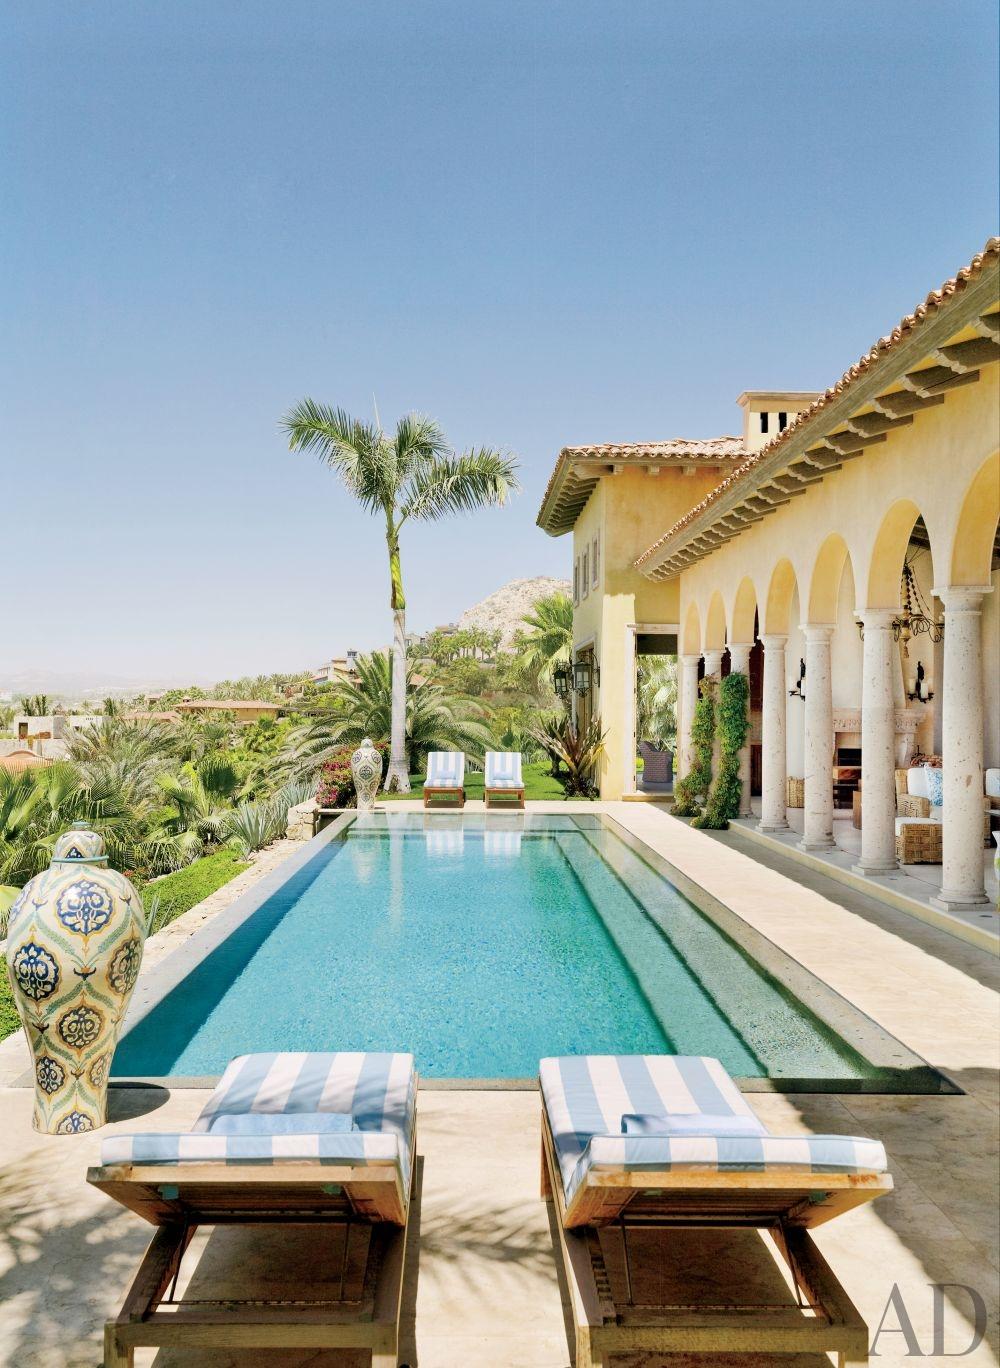 exotic-pool-marshall-watson-interiors-san-jos-del-cabo-mexico-201305_1000-watermarked